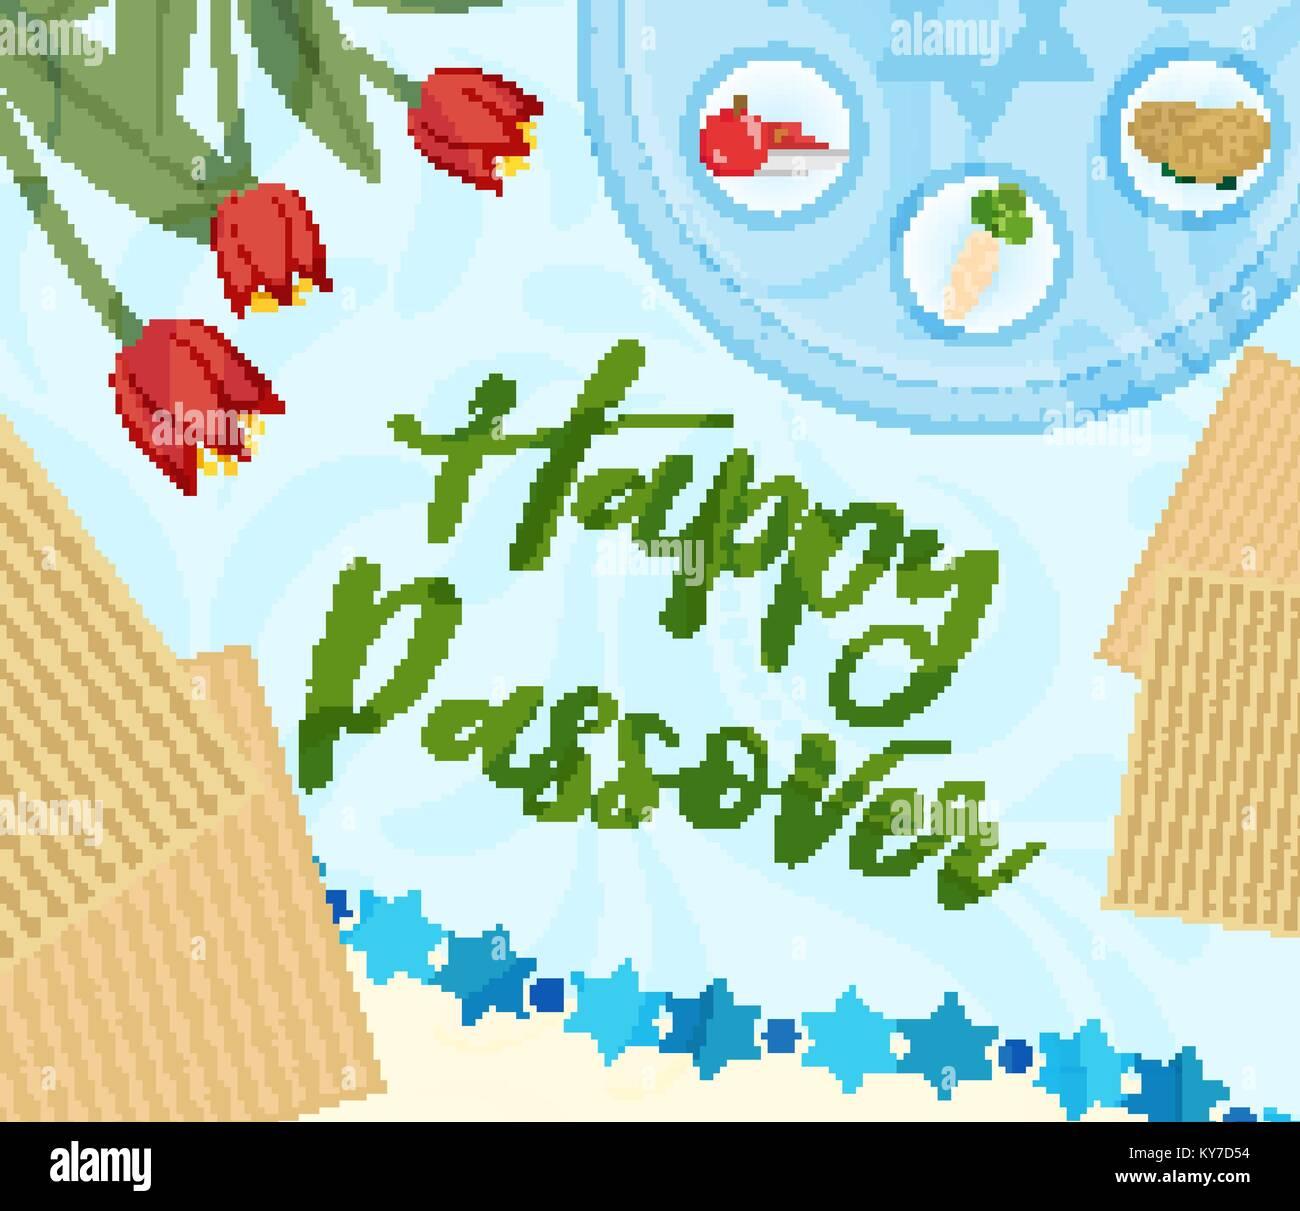 Passover poster invitation flyer greeting card pesach template passover poster invitation flyer greeting card pesach template for your design with festive seder table kosher food matzah david star m4hsunfo